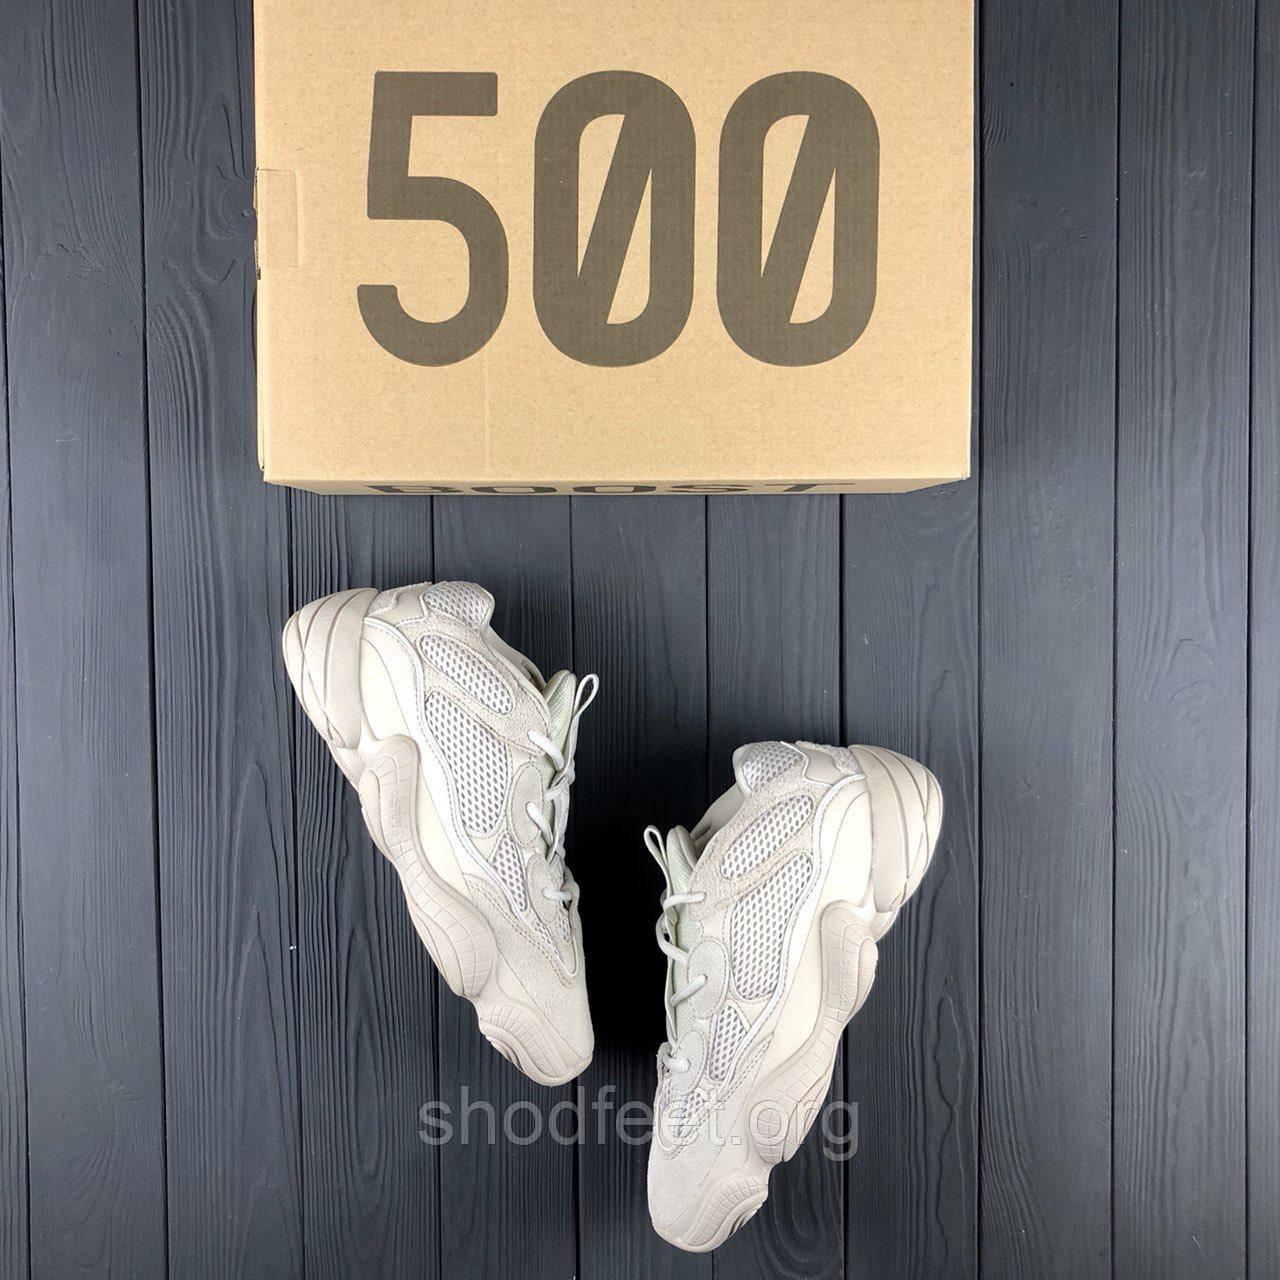 c8b30c0d Мужские кроссовки Adidas Yeezy 500 Blush , цена 1 649 грн., купить в  Харькове — Prom.ua (ID#746183466)